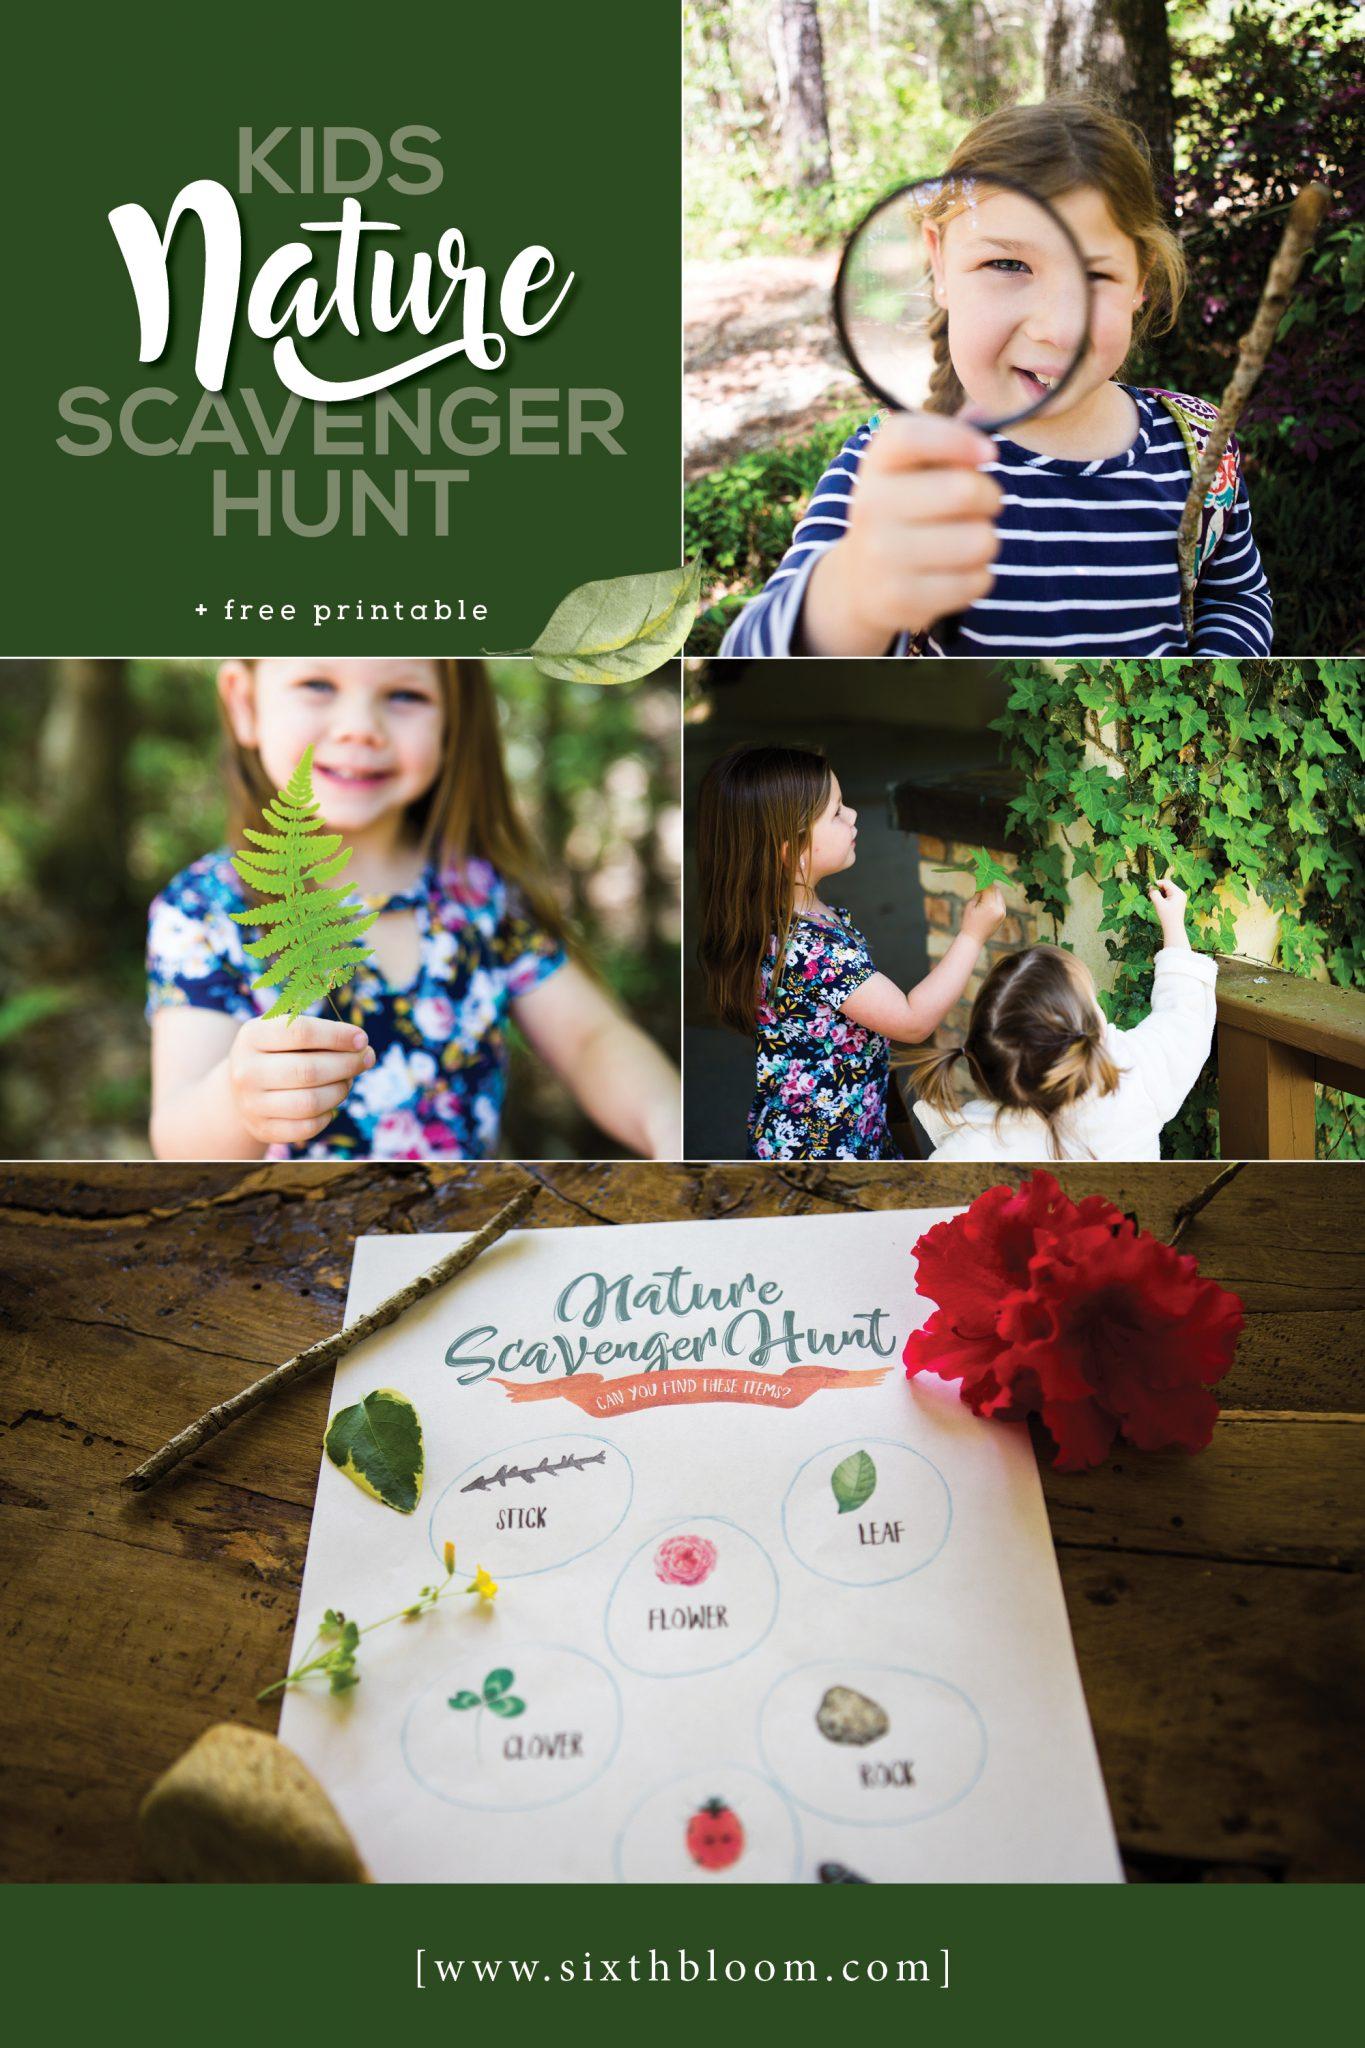 Kids Nature Scavenger Hunt Free Printable